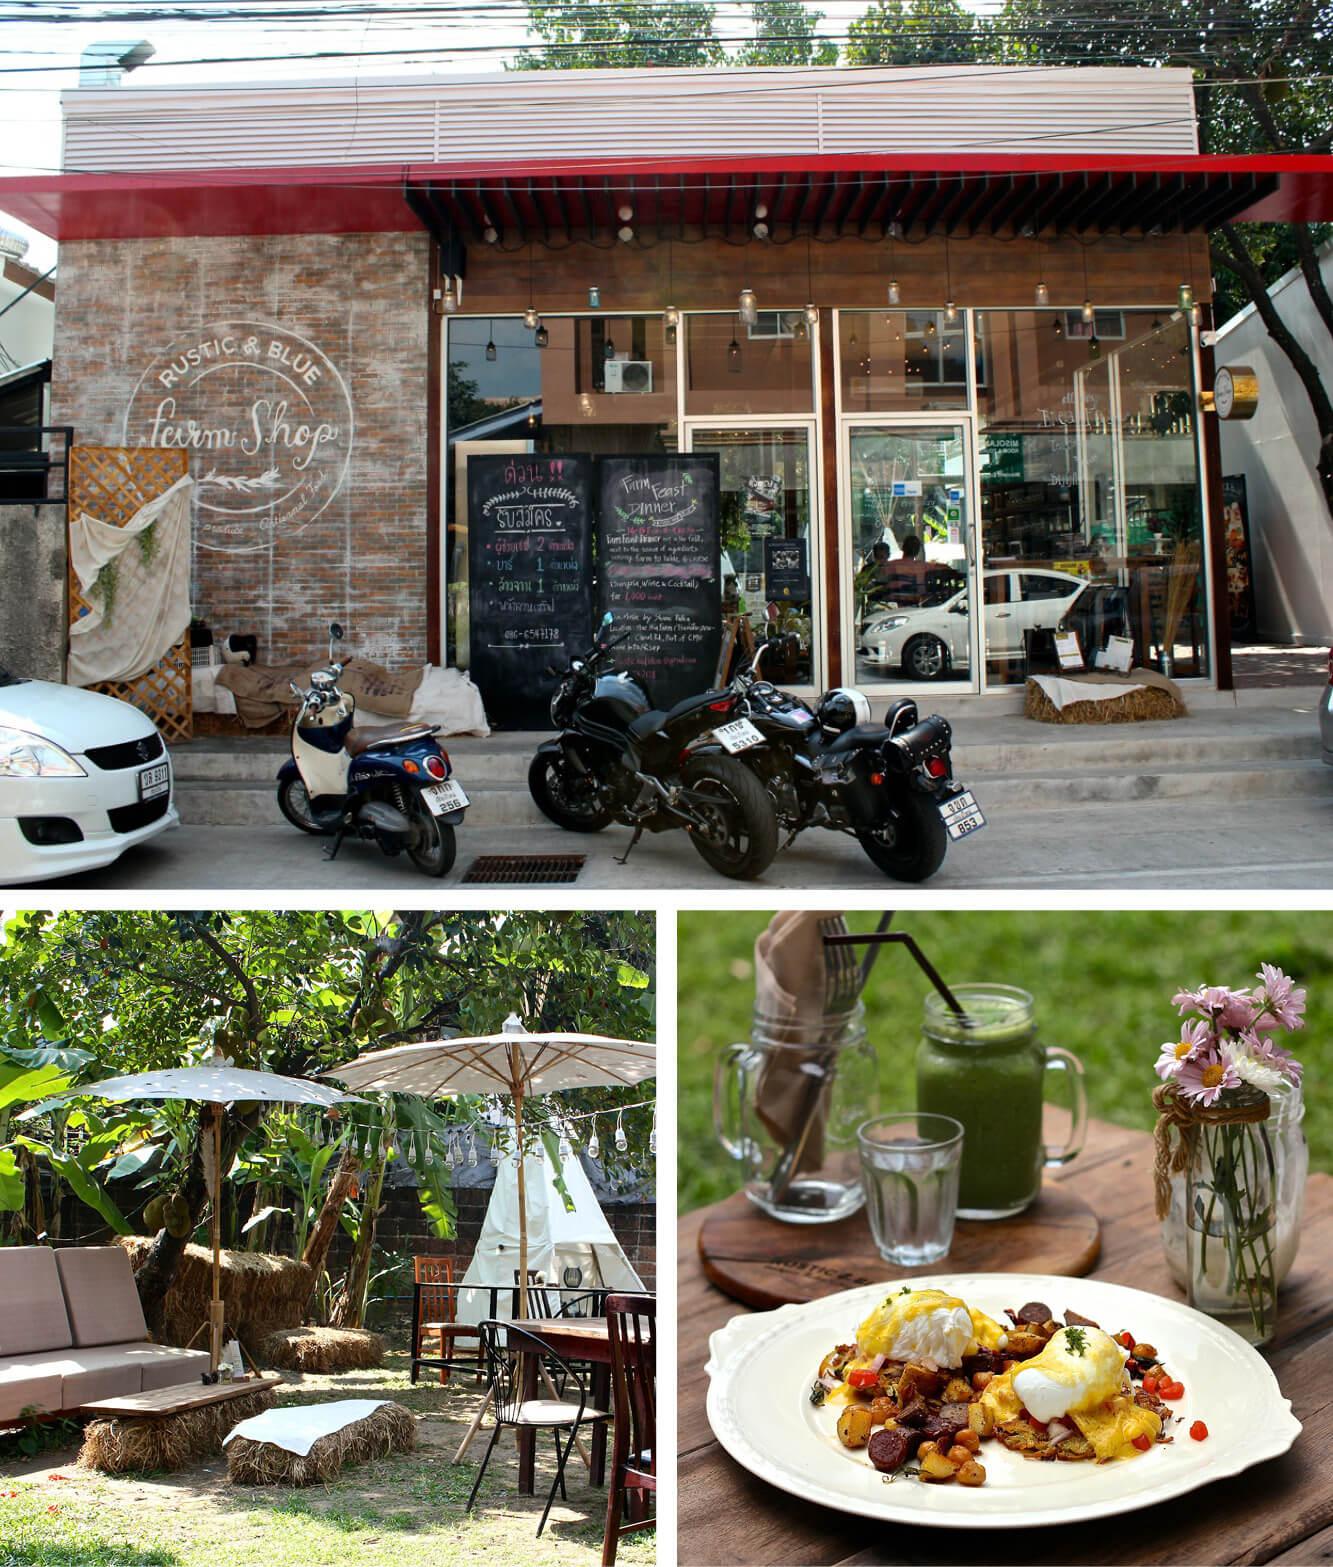 Top 3 Healthy And Paleo-Friendly Breakfast Restaurants In